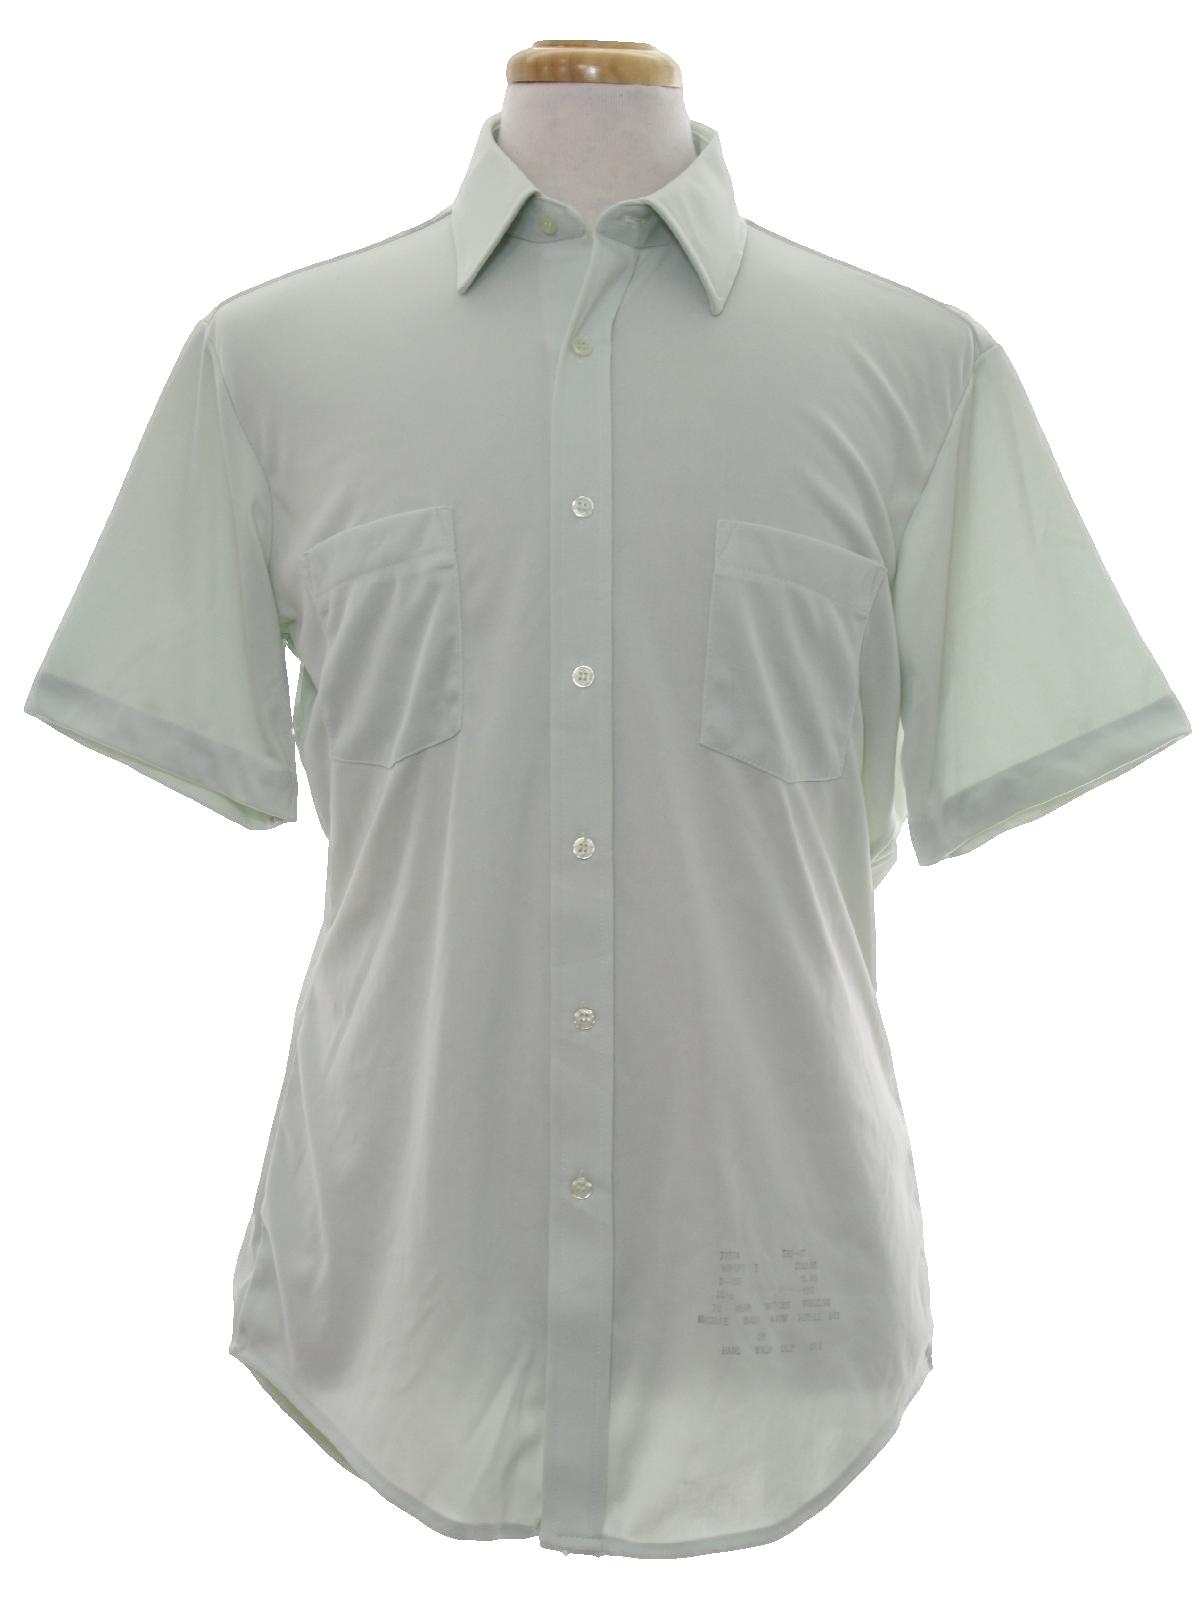 70 39 s vintage disco shirt 70s sears mens pale celedon for Solid color button up shirts